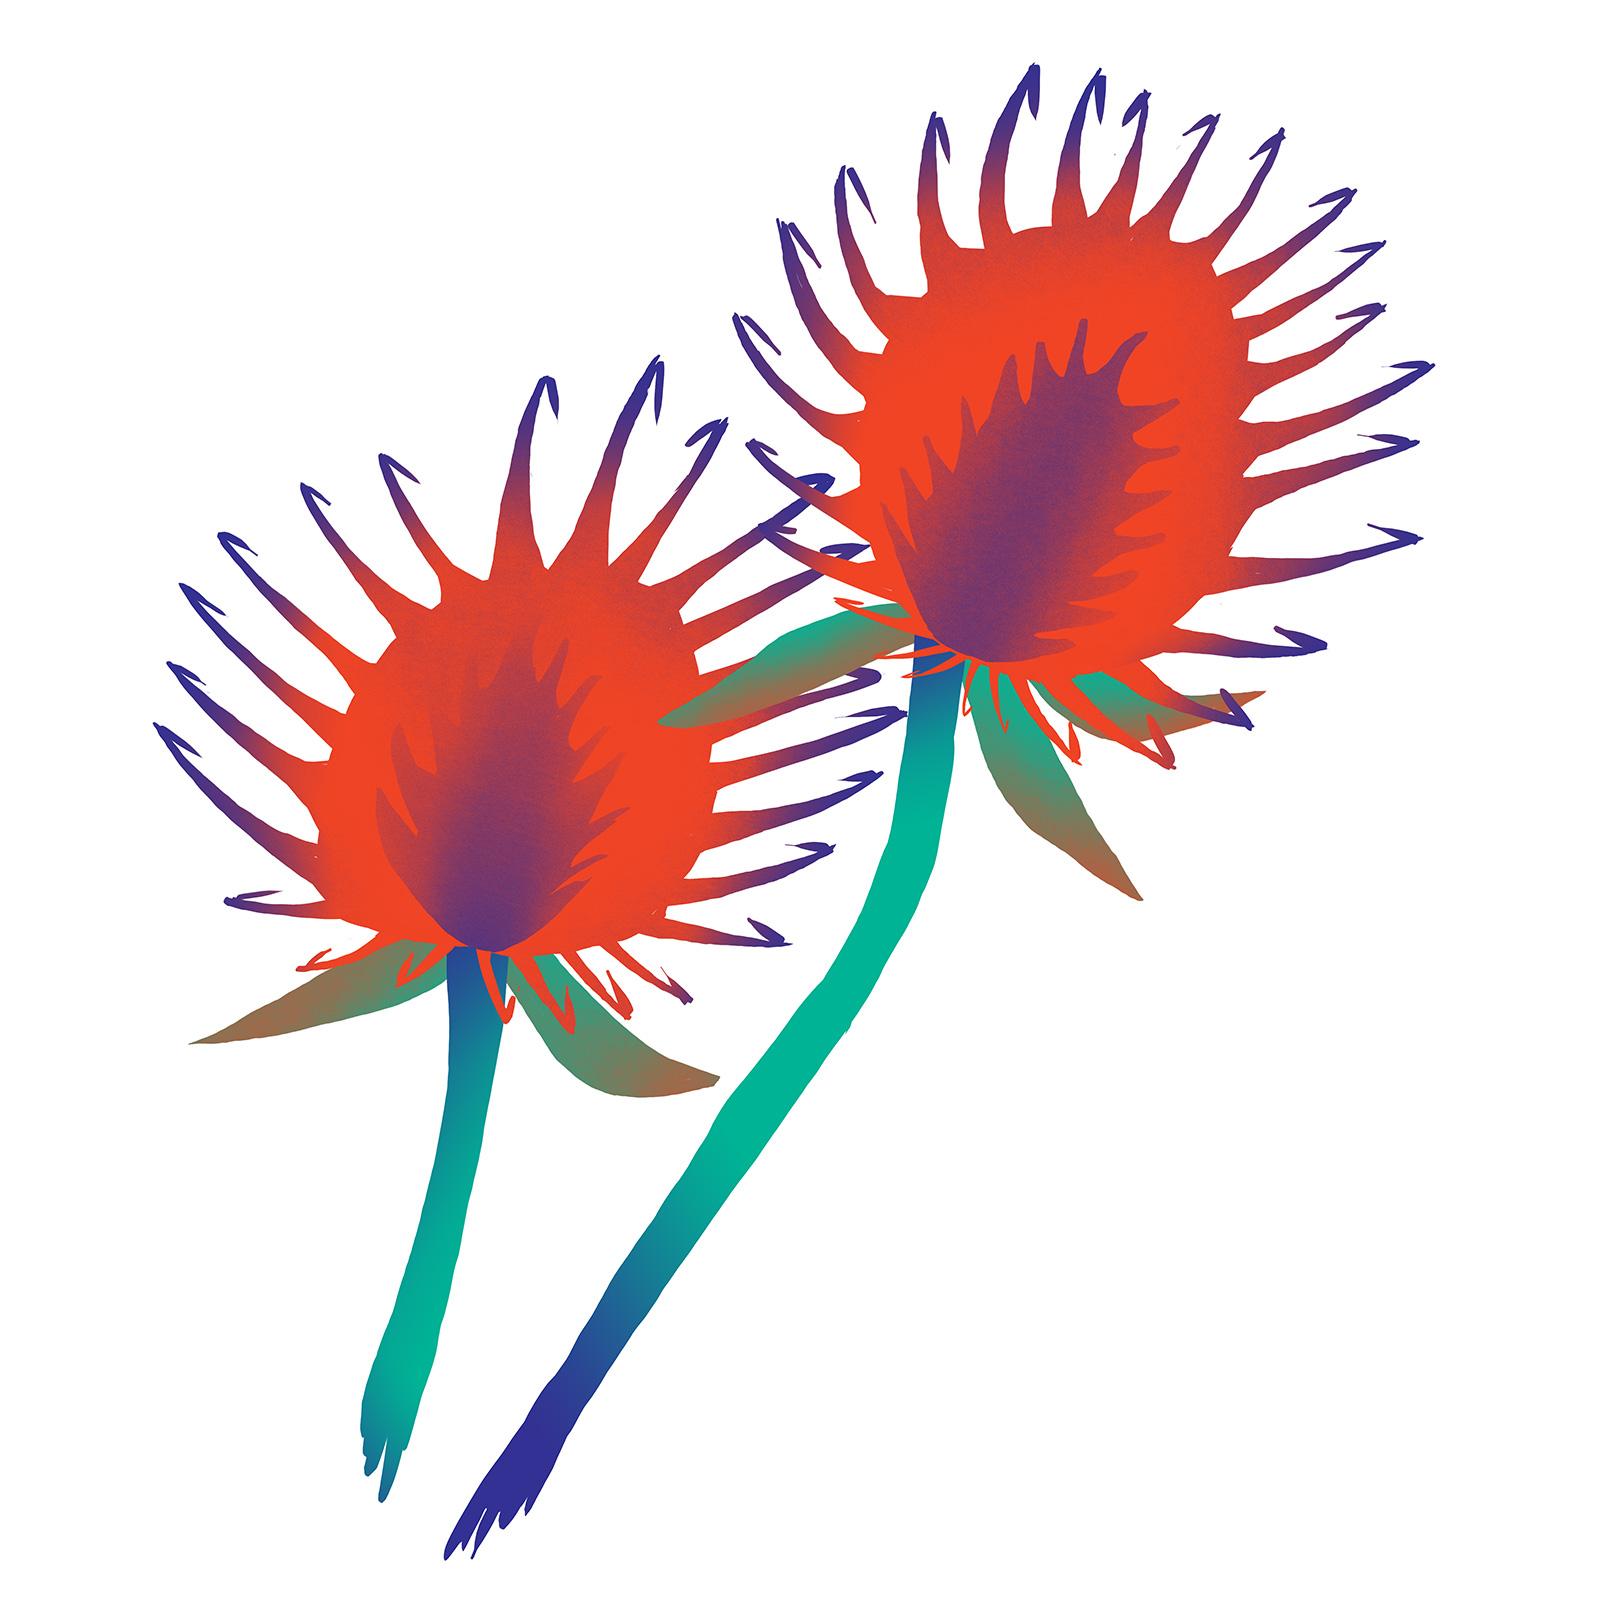 burr-biomimicry-digital-illustration-by-Fiona-Dunnett.jpg